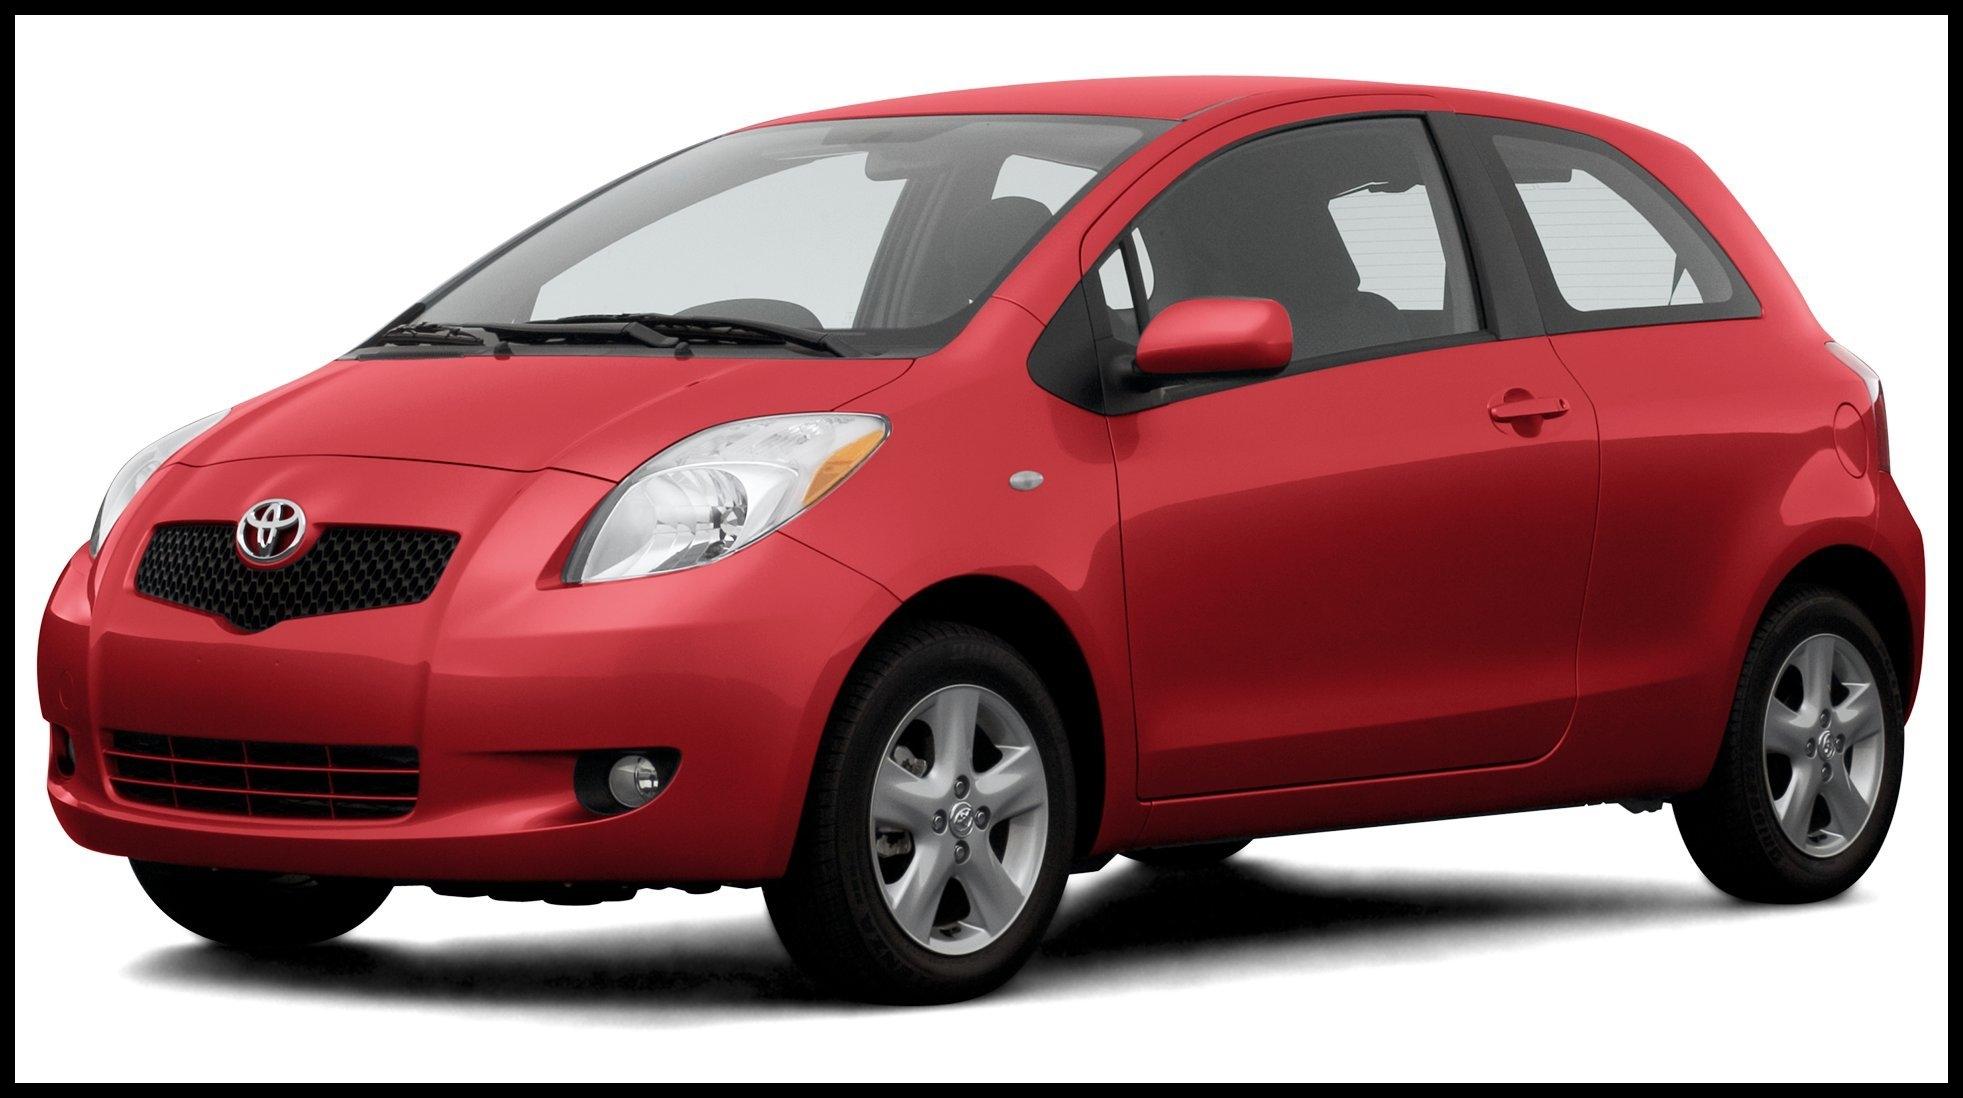 2007 Toyota Yaris 3 Door Hatchback Automatic Transmission GS